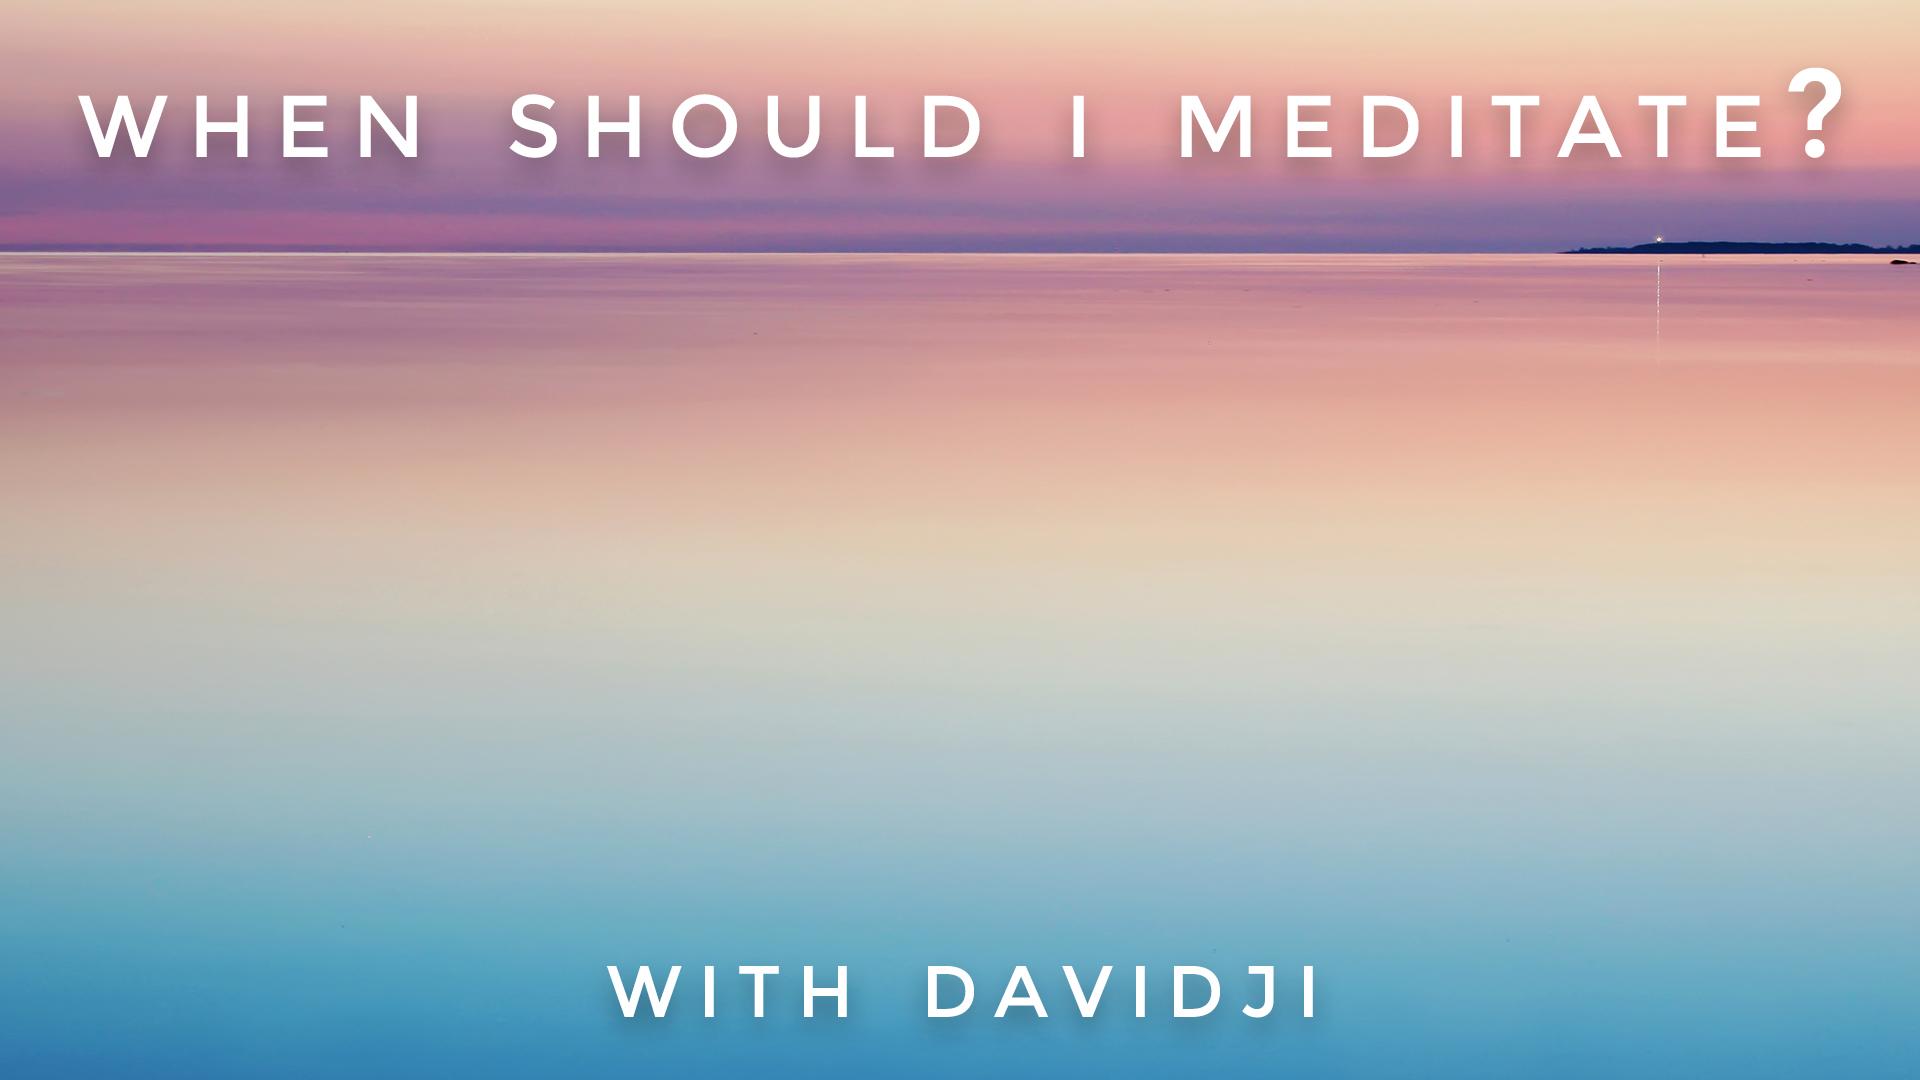 Unplug-Meditation-VHX-VIDEO-Cover-Artwork_Davidji_When-should-i-meditate.jpg